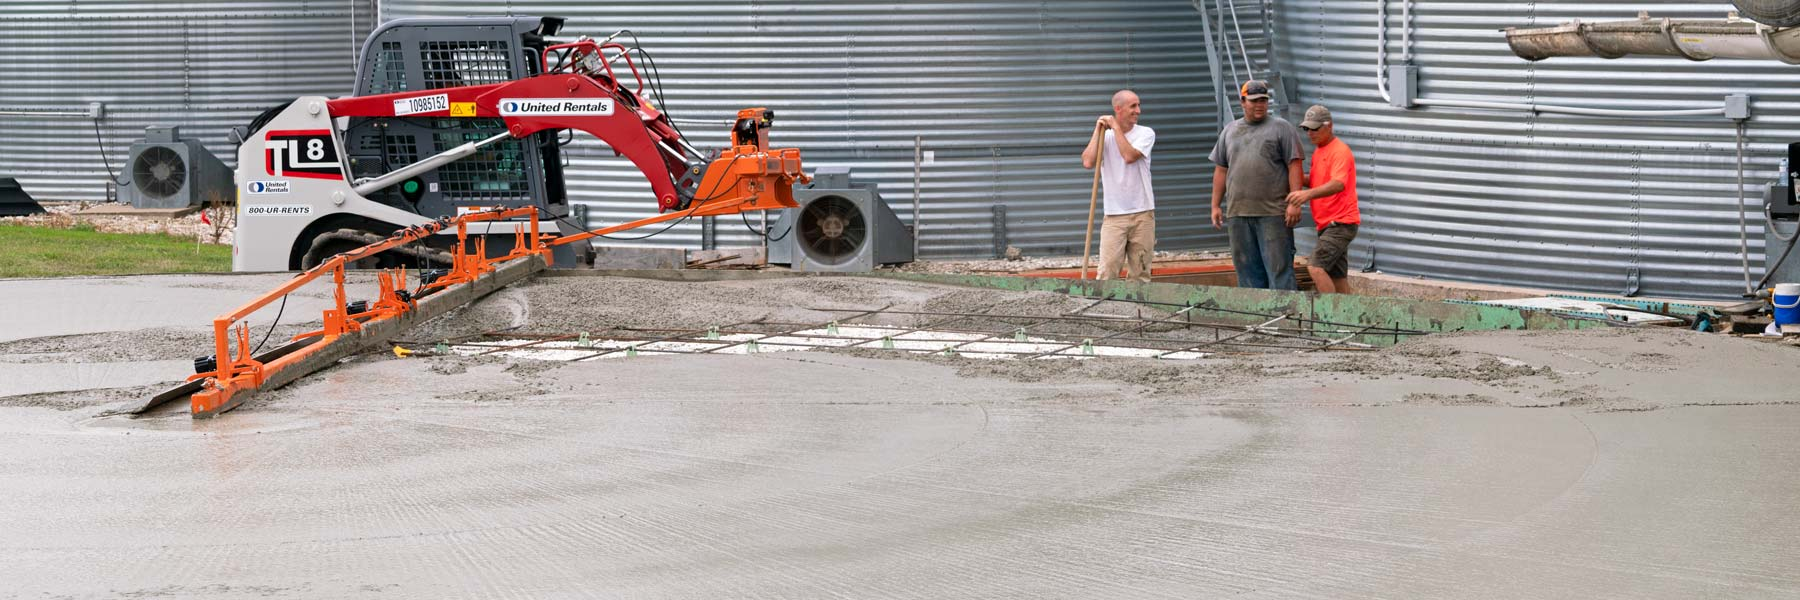 A happy concrete crew talks near a freshly poured concrete pad.